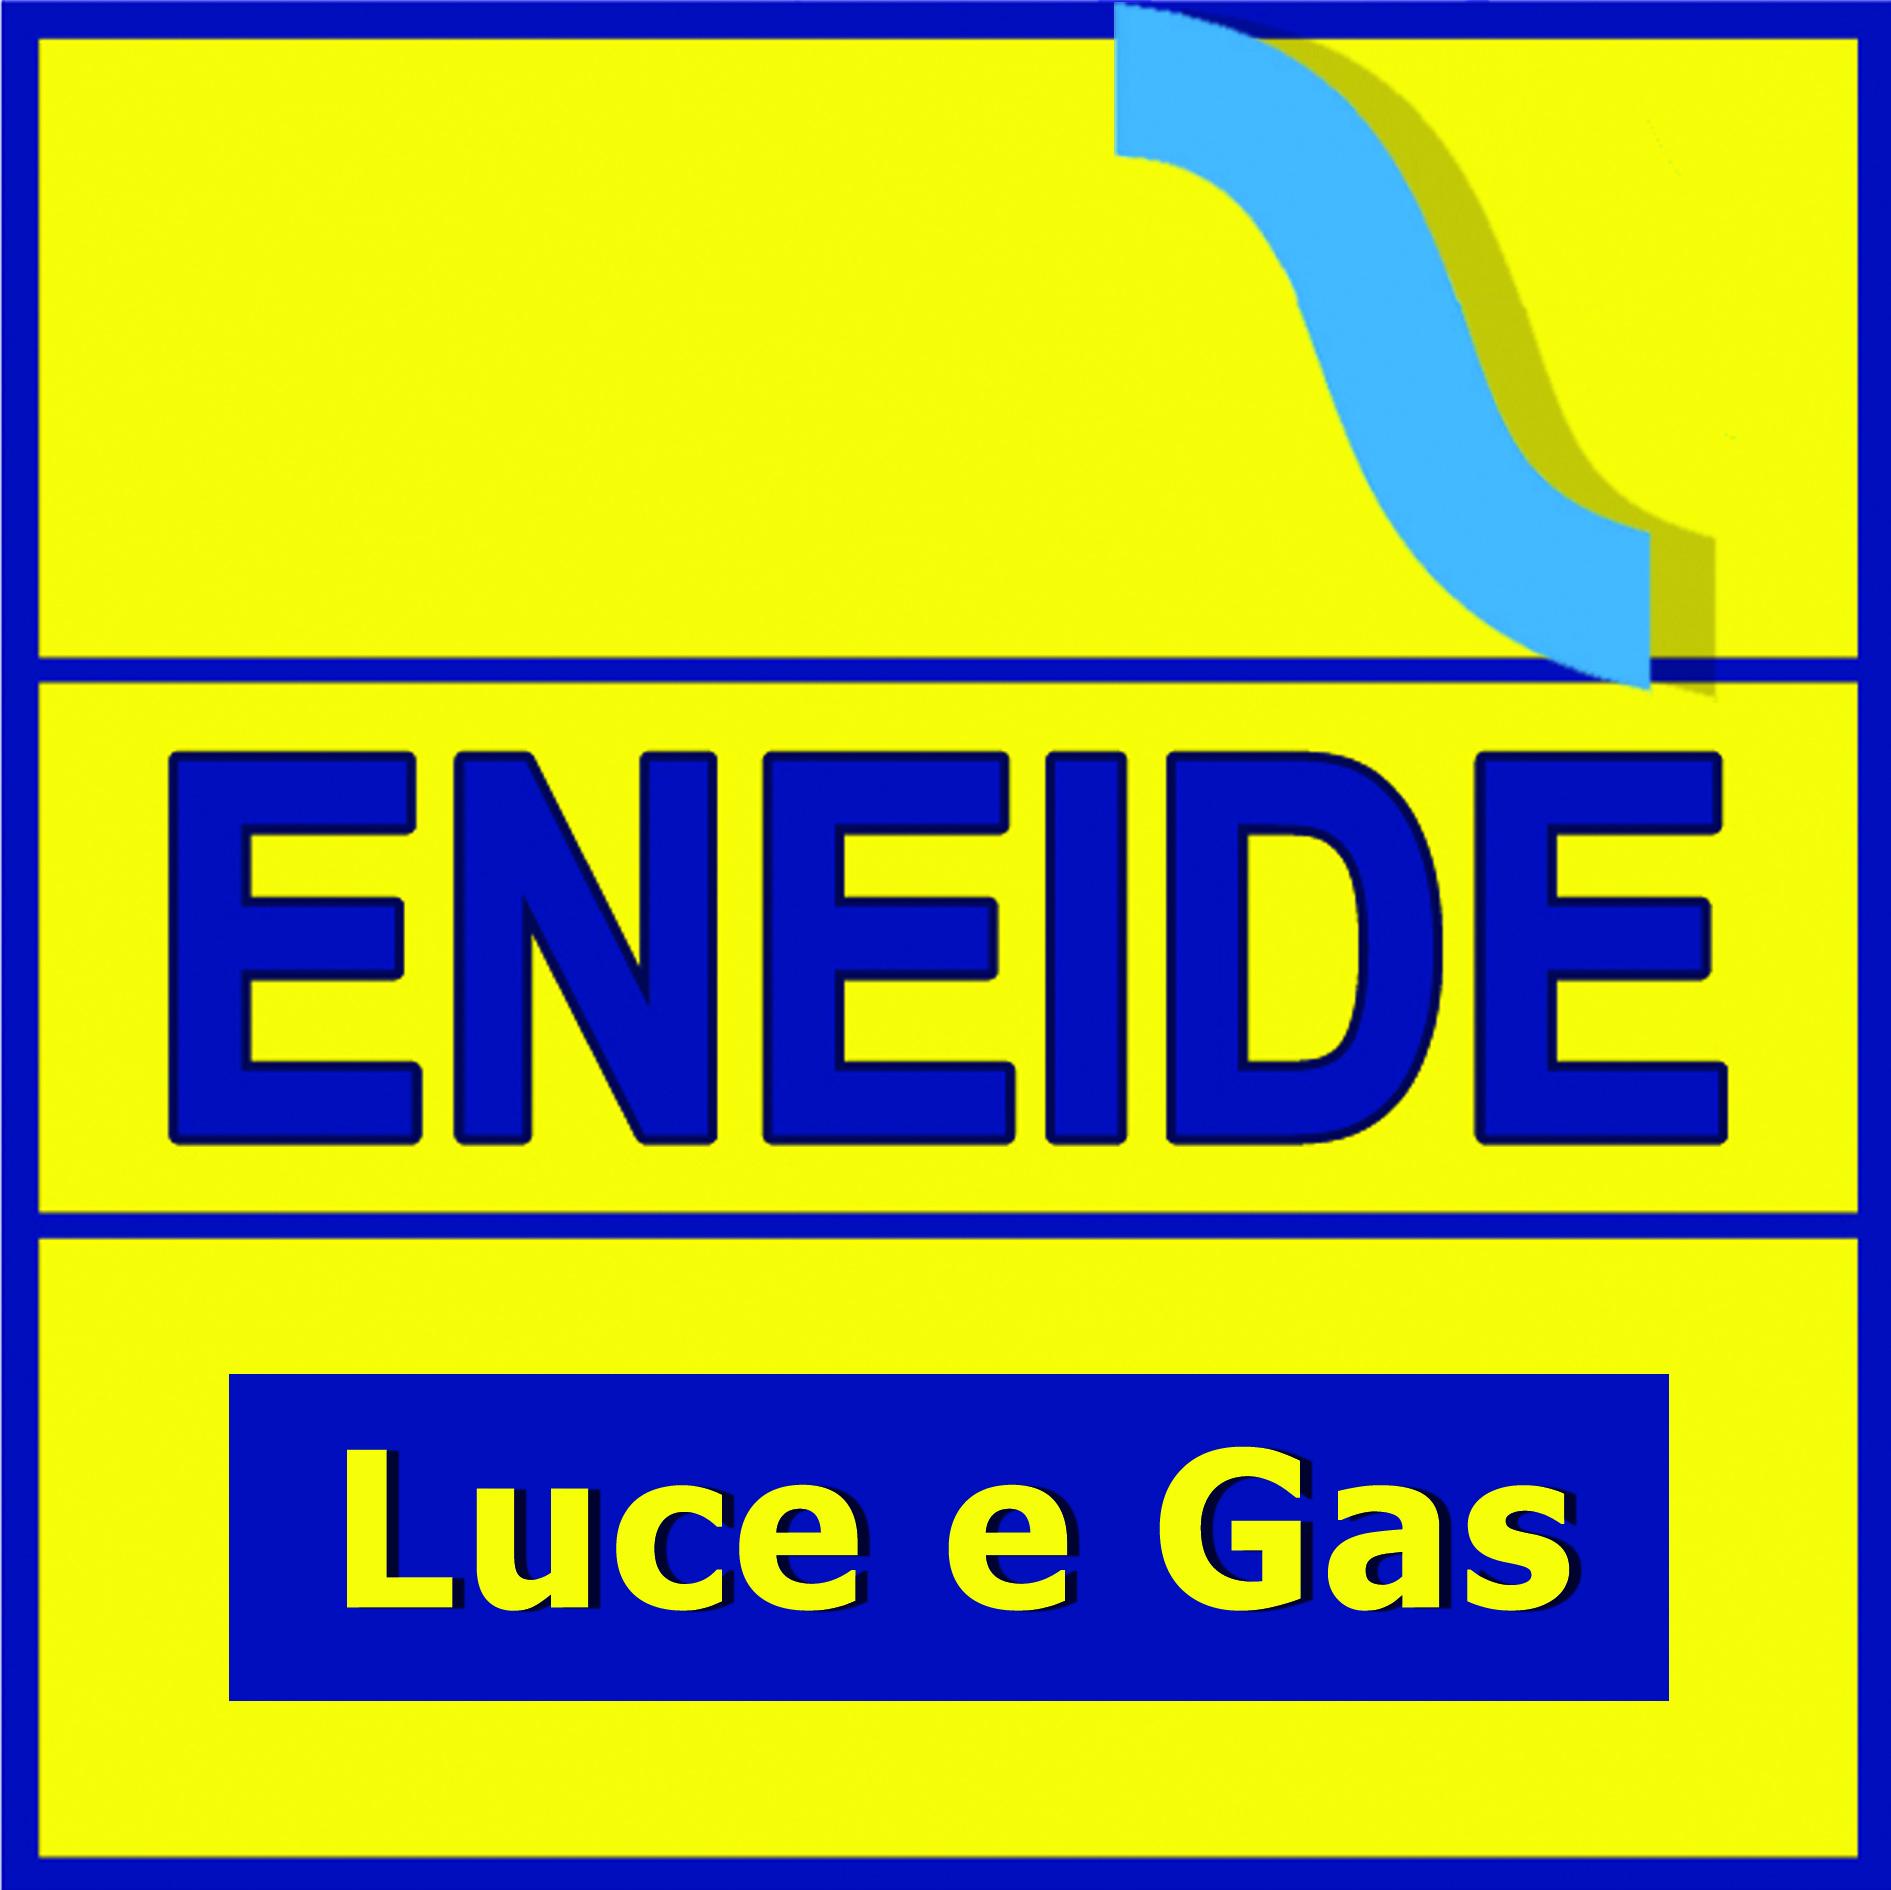 Eneide S.r.l.